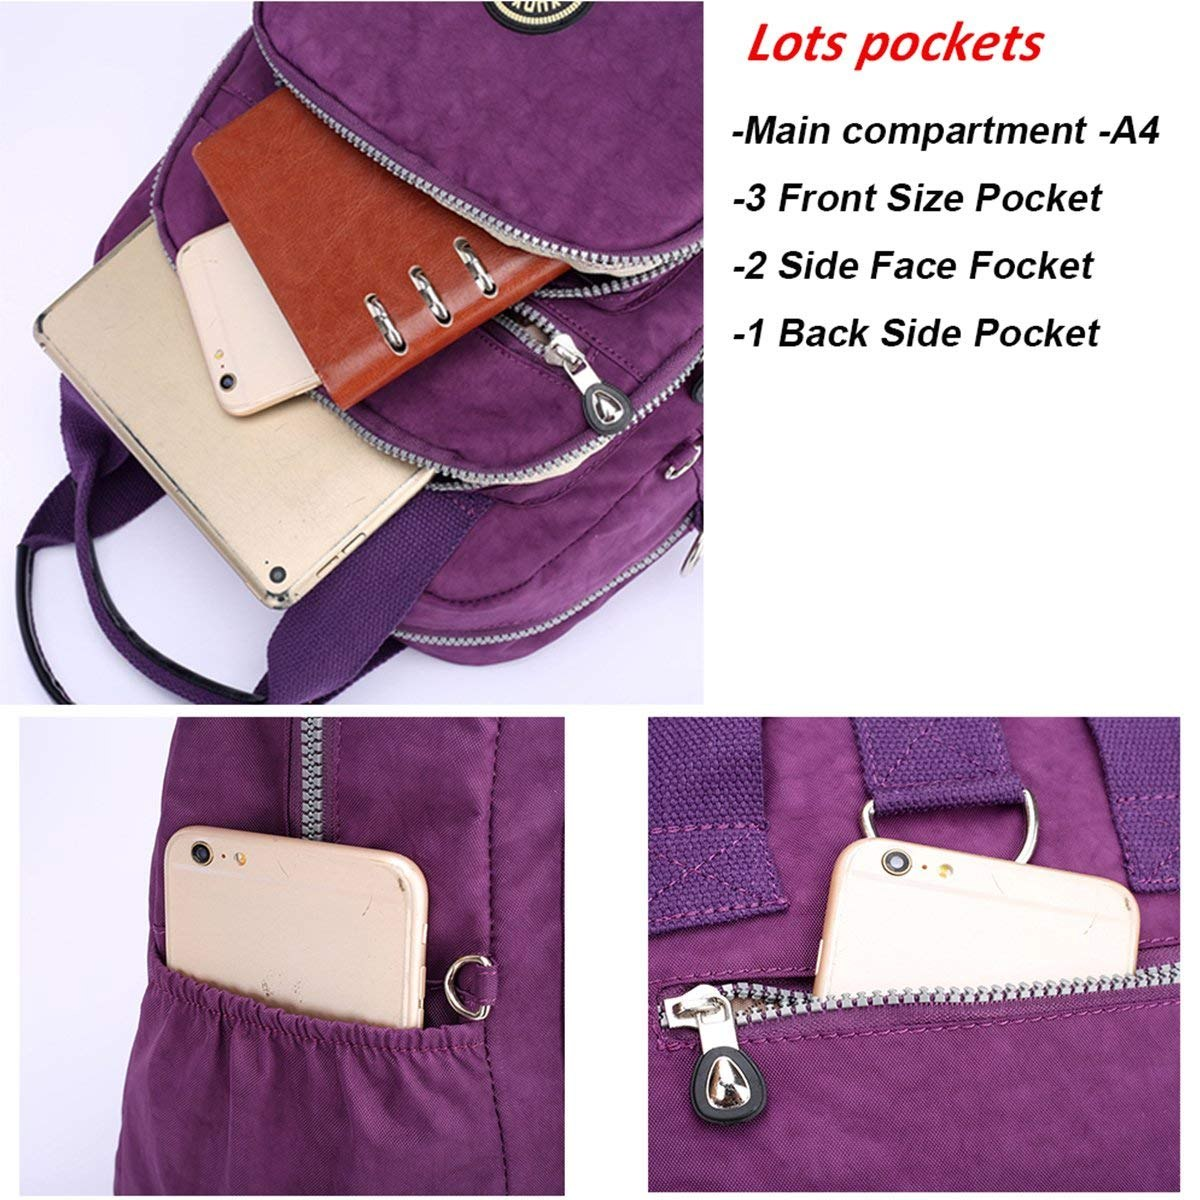 976f6cc743b travistar mini mochila para mujeres niñas nylon ligero moch. Cargando zoom.